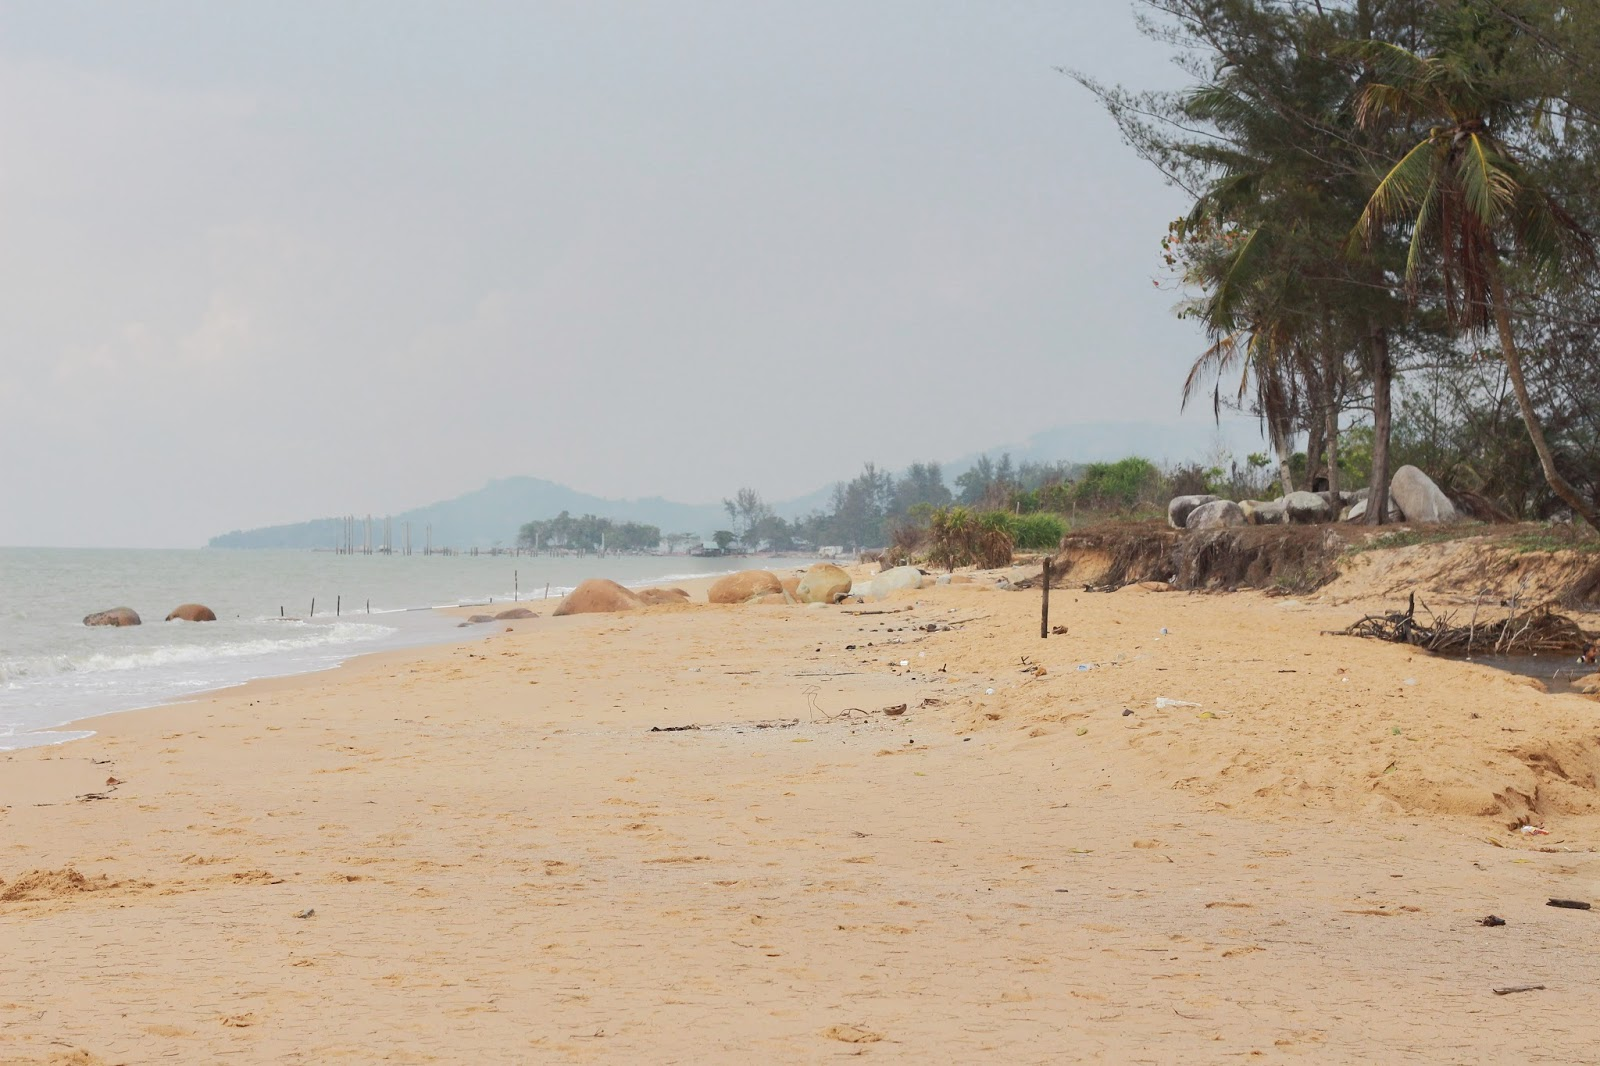 Kura Beach Kalimantan Barat Teknik Informatika Untan Hamparan Pasir Sepanjang